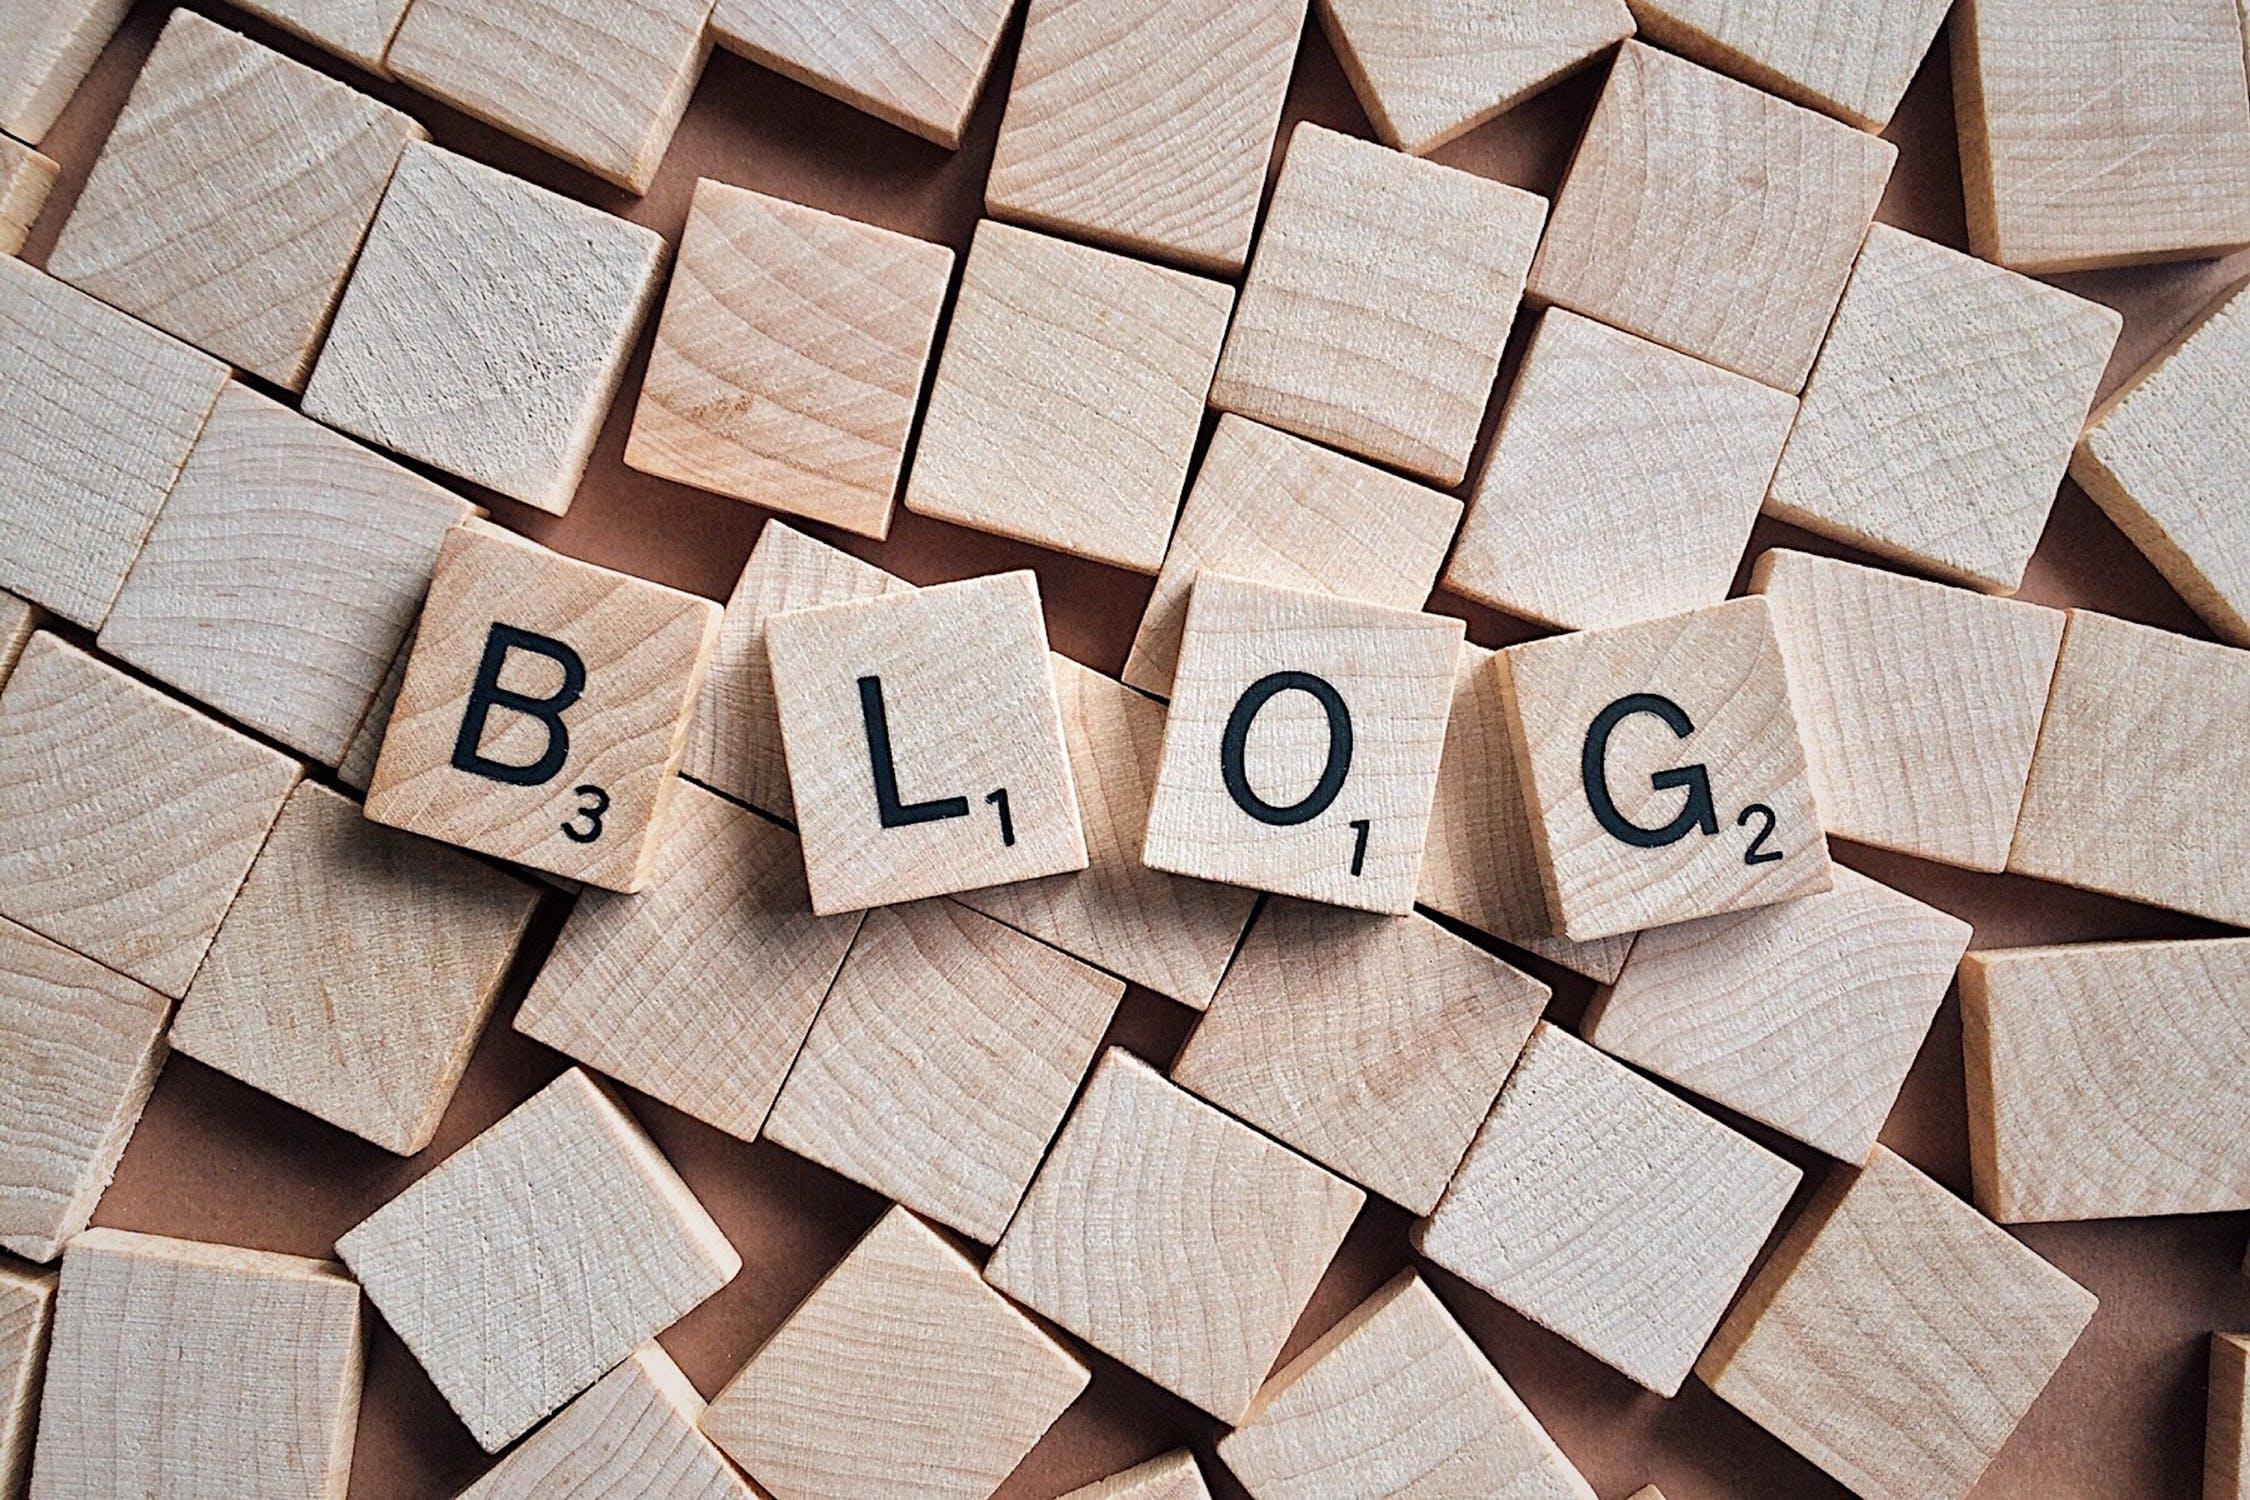 Blog word on wooden blocks